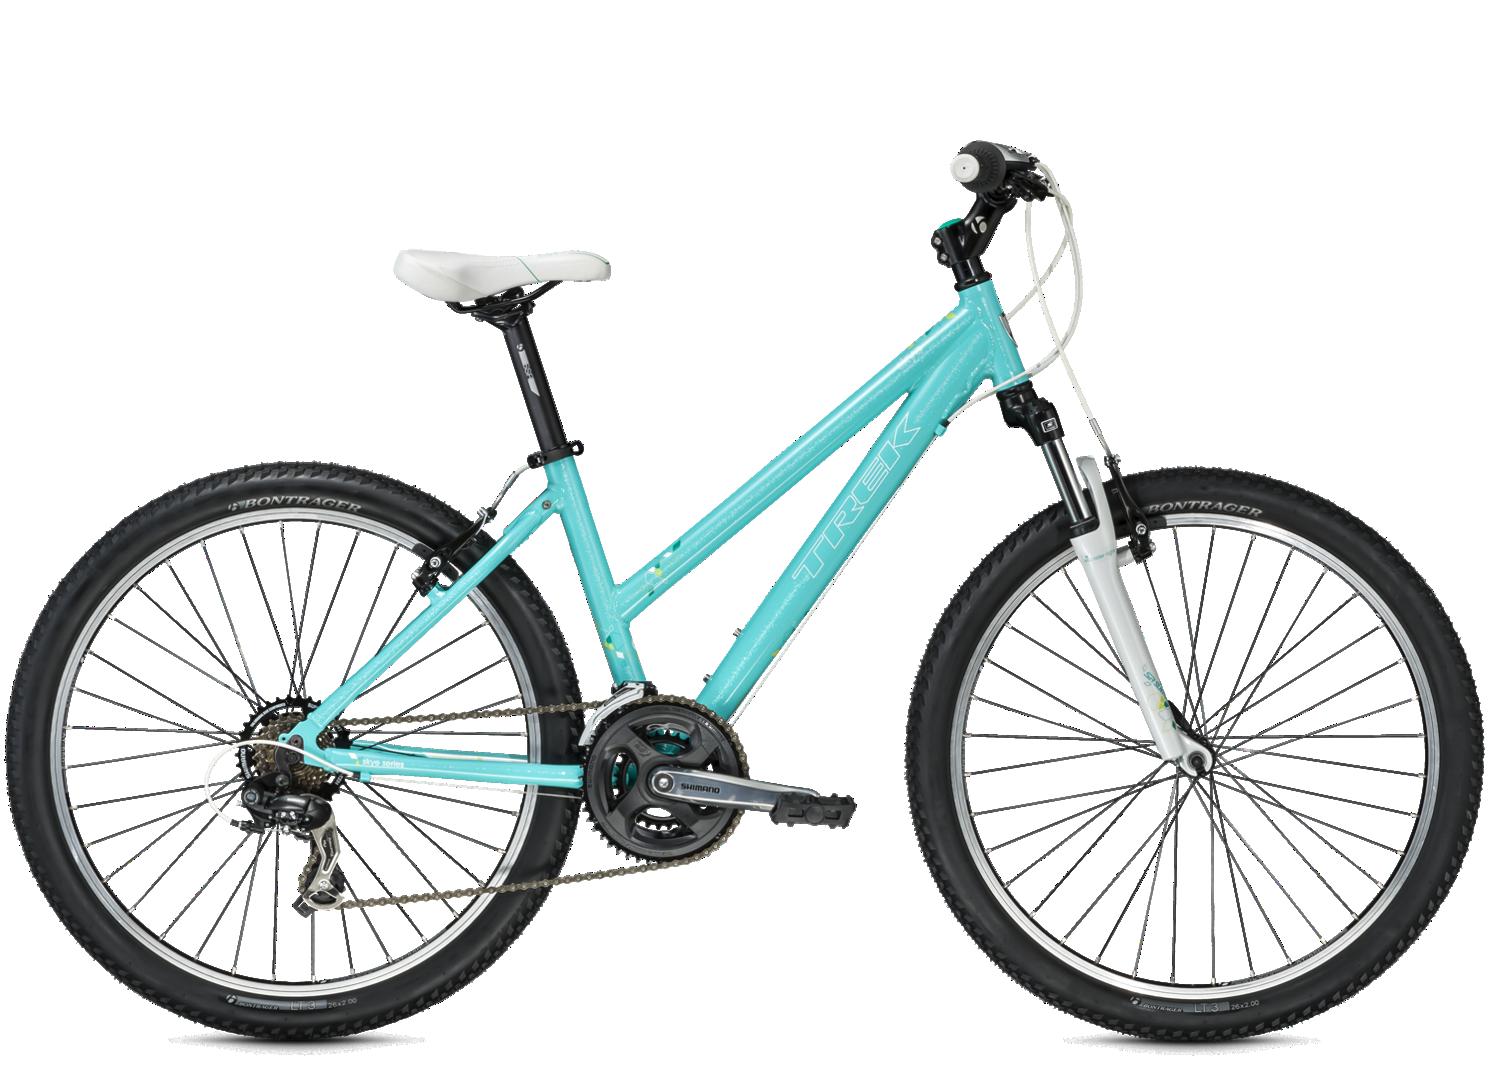 Bicicleta SKYE 26